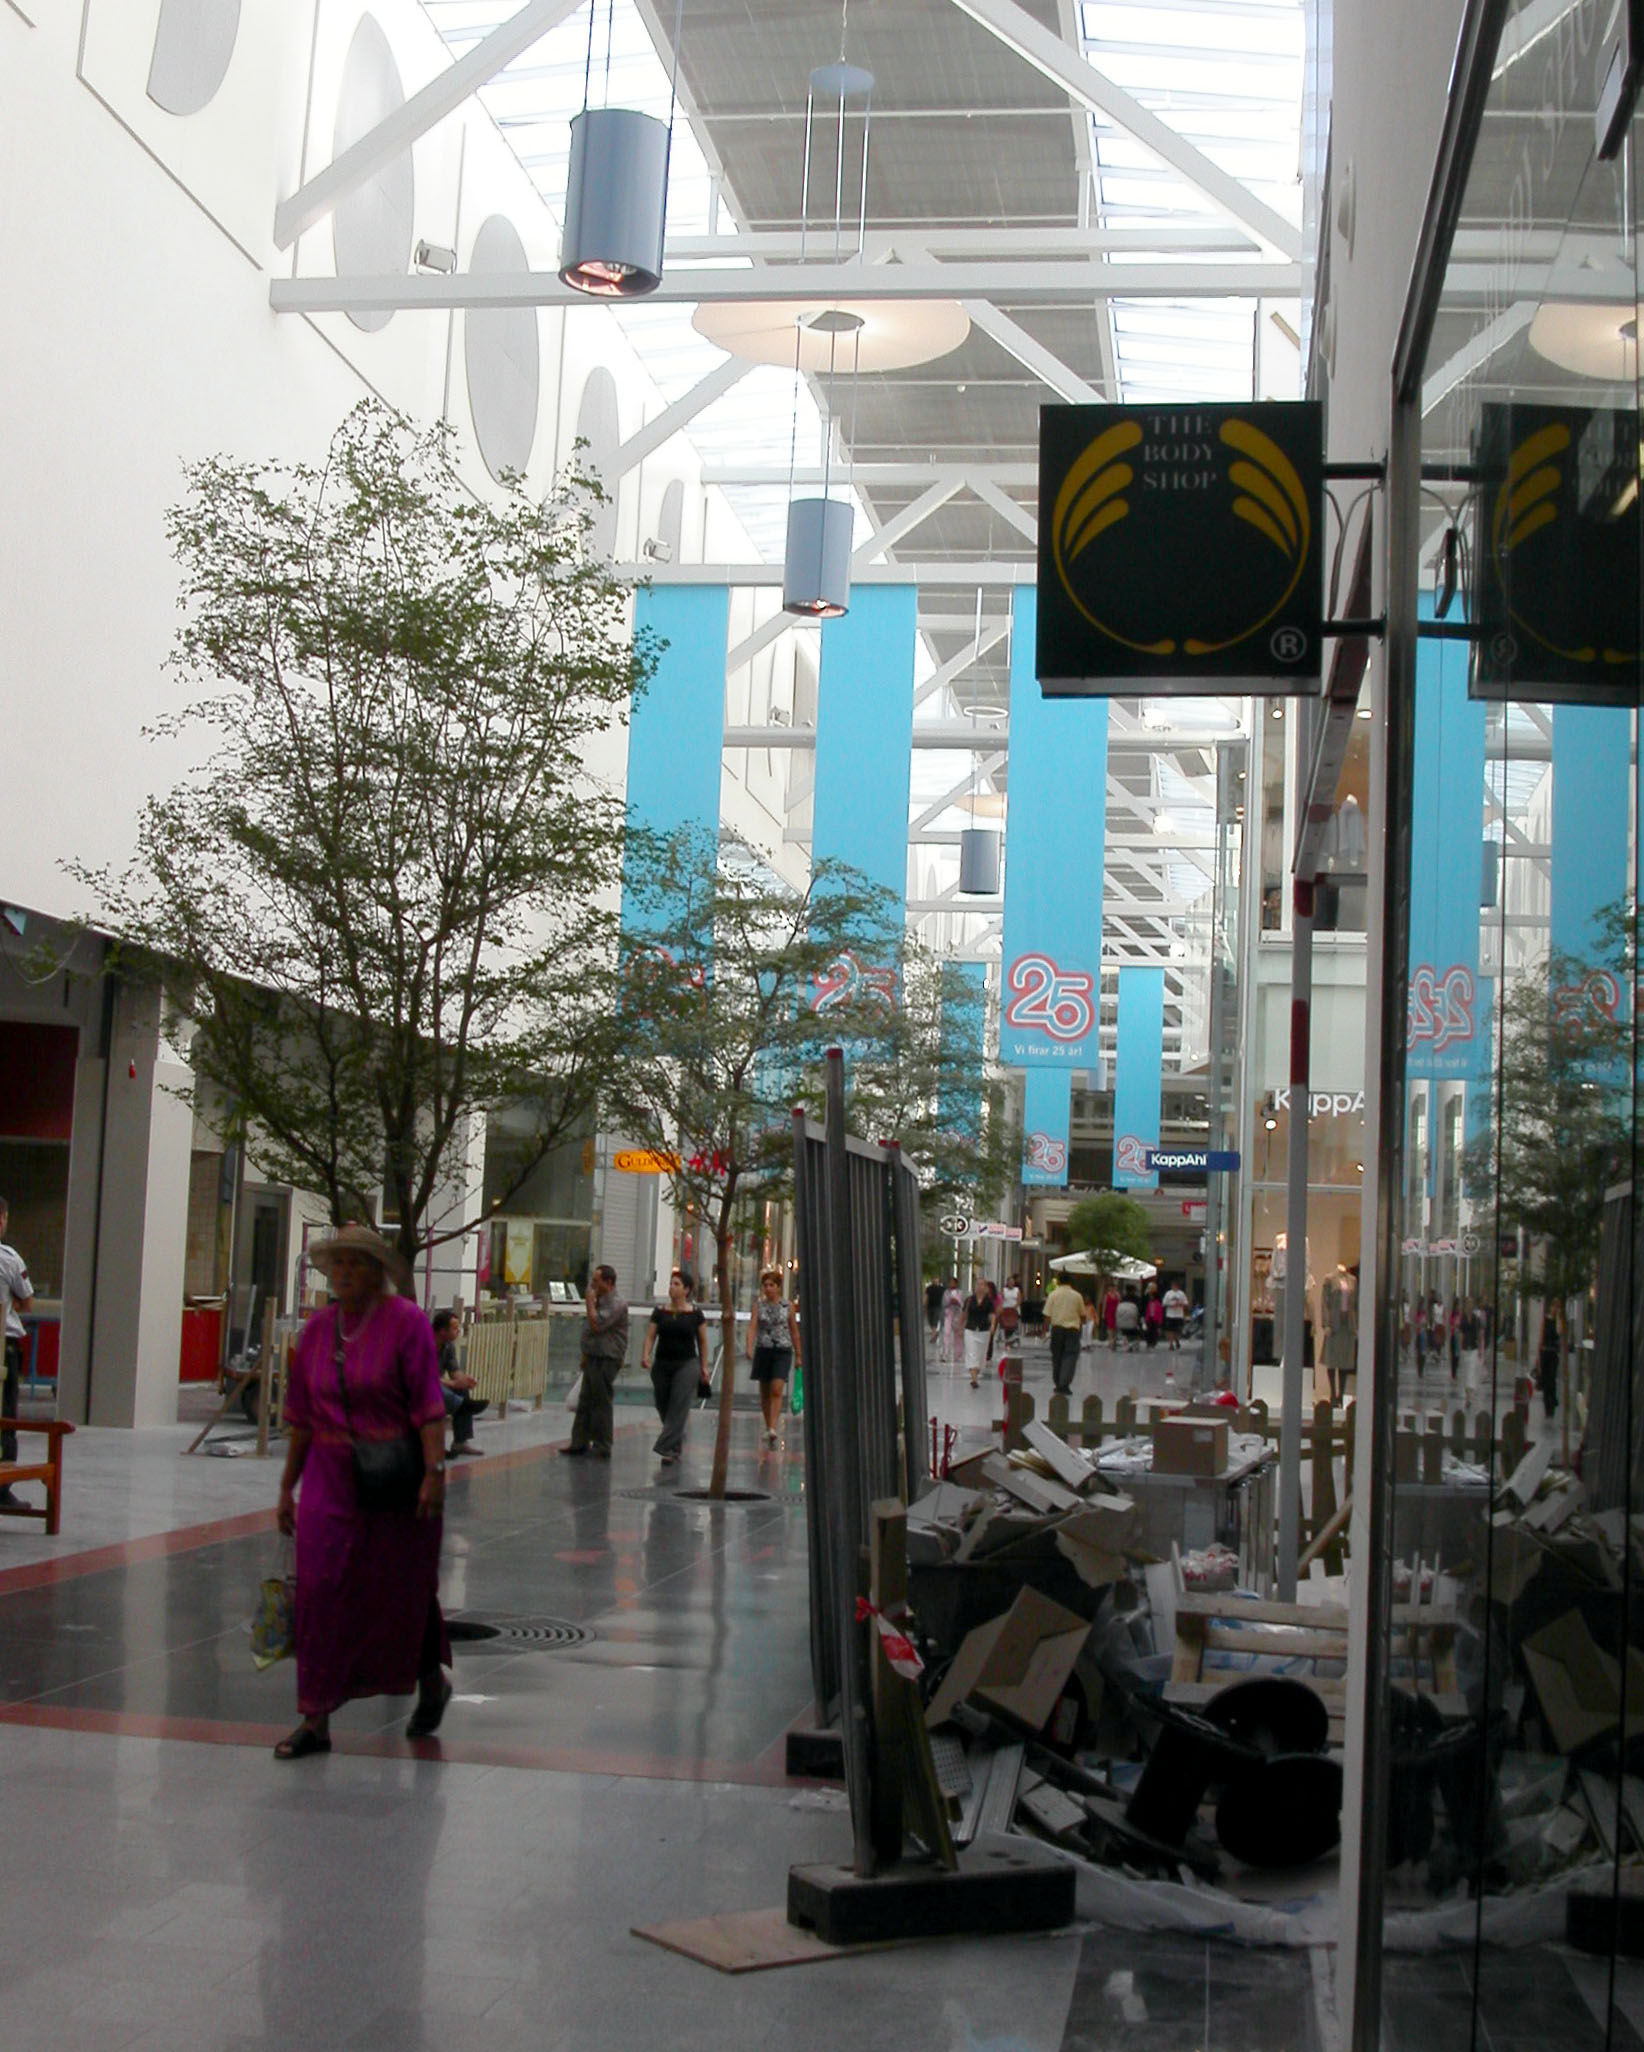 Ica Kista Galleria Öppettider Midsommar